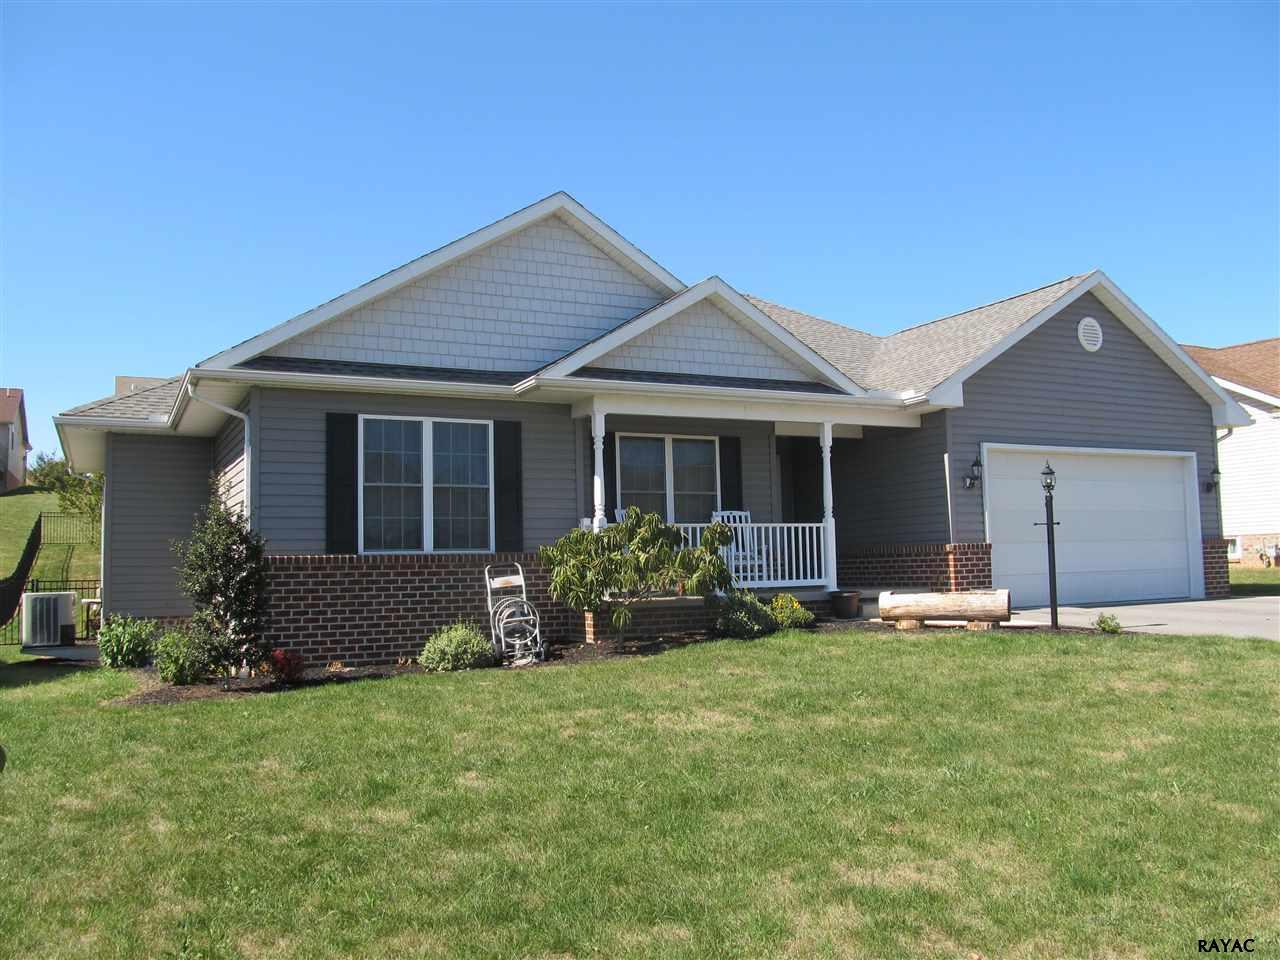 304 Tritle Ave, Waynesboro, PA 17268